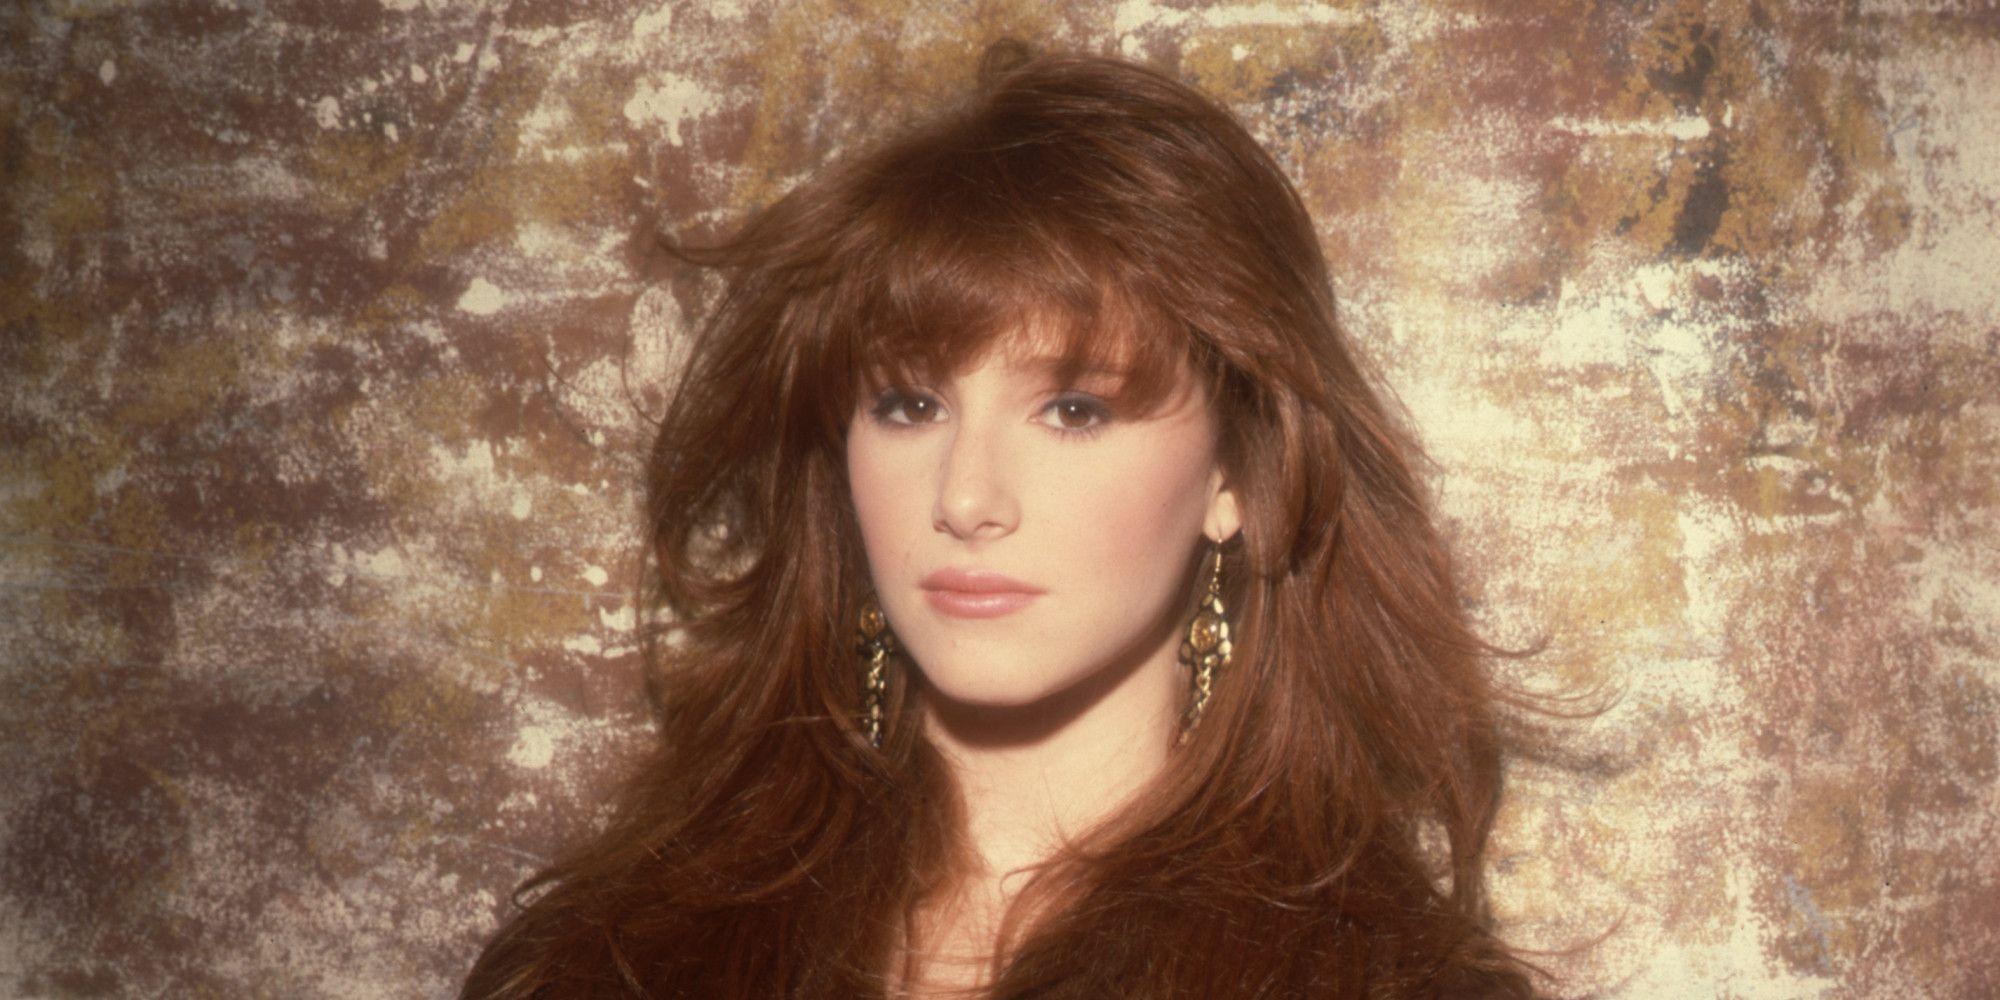 Why '80s Pop Princess Tiffany Posed For Playboy hear